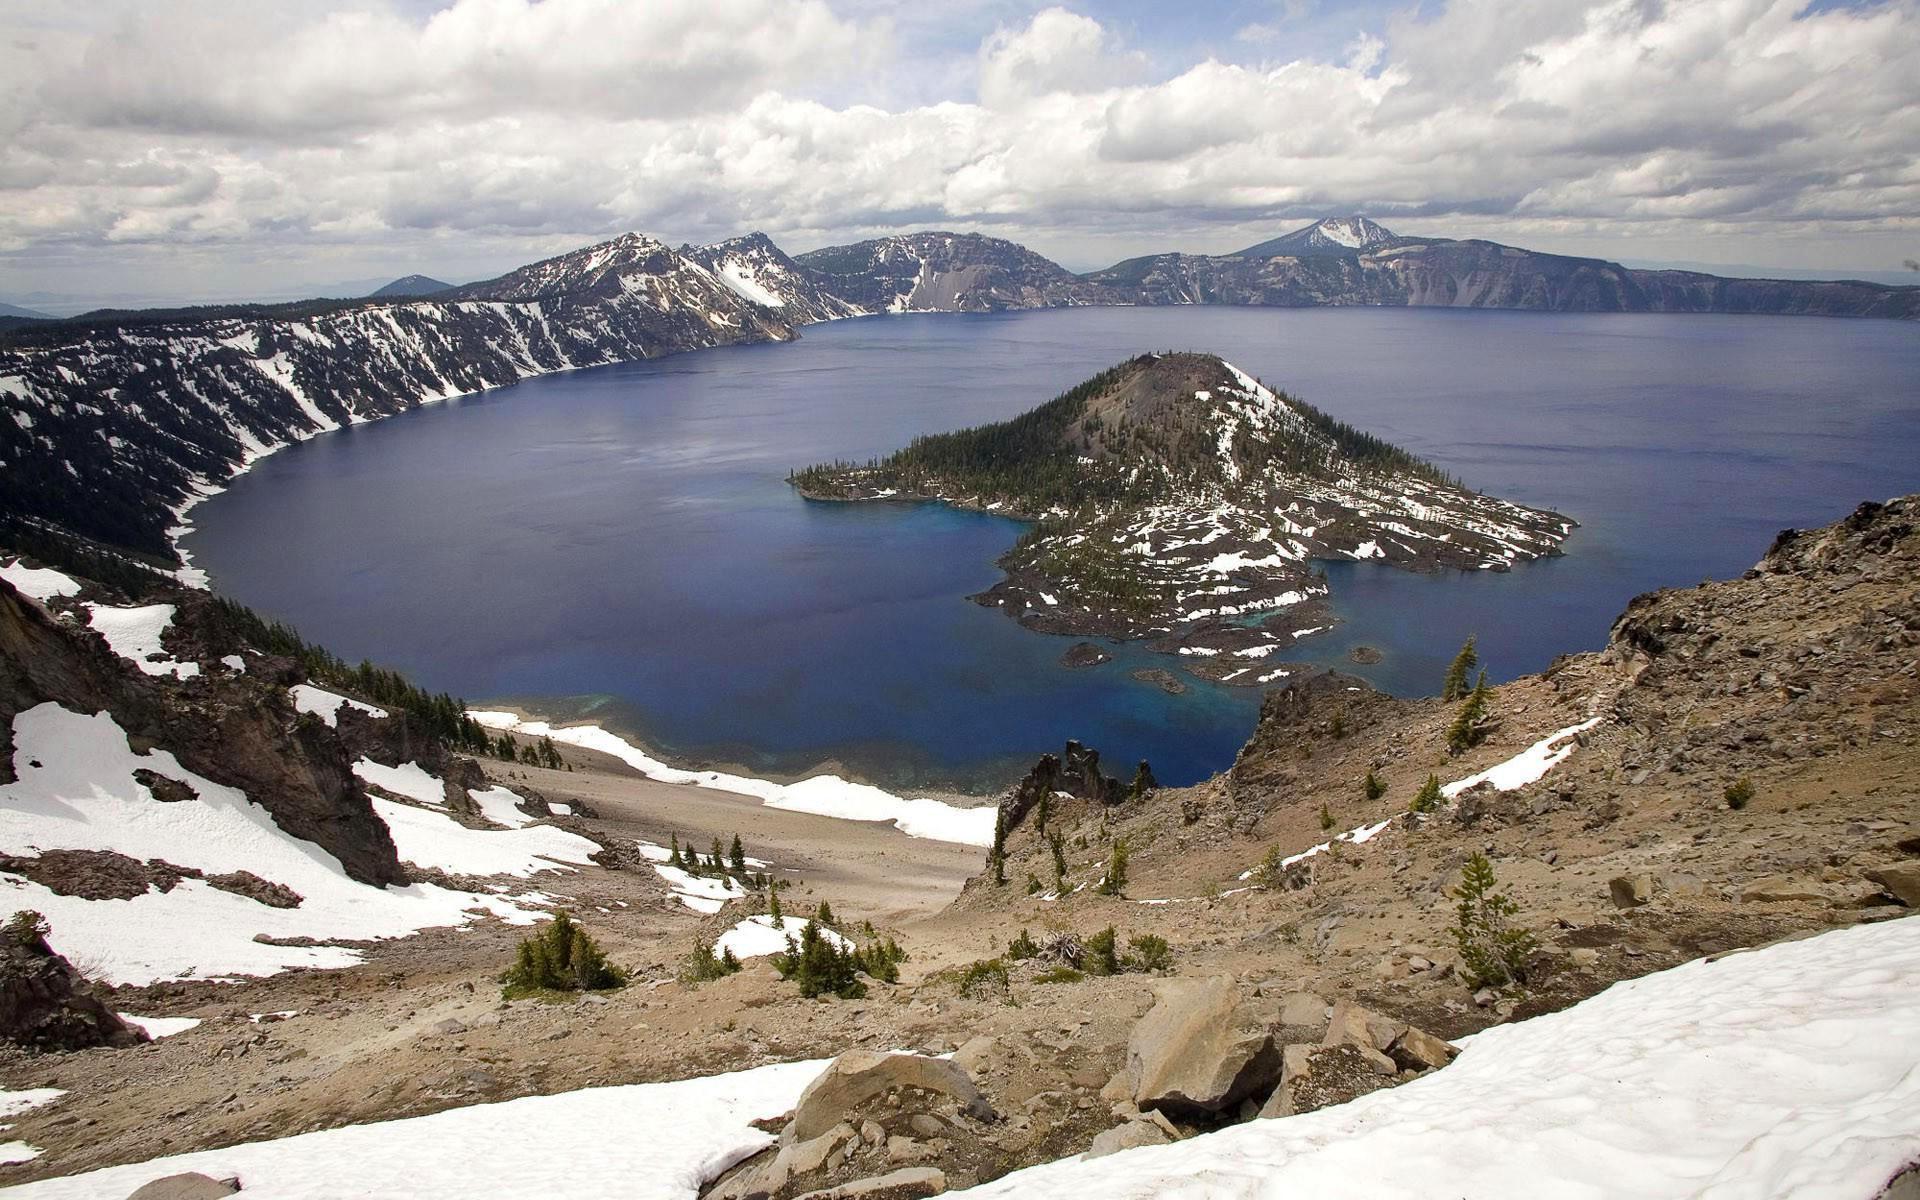 28525-trees-united-state-lake-mountain-oregon-mazama-volcano